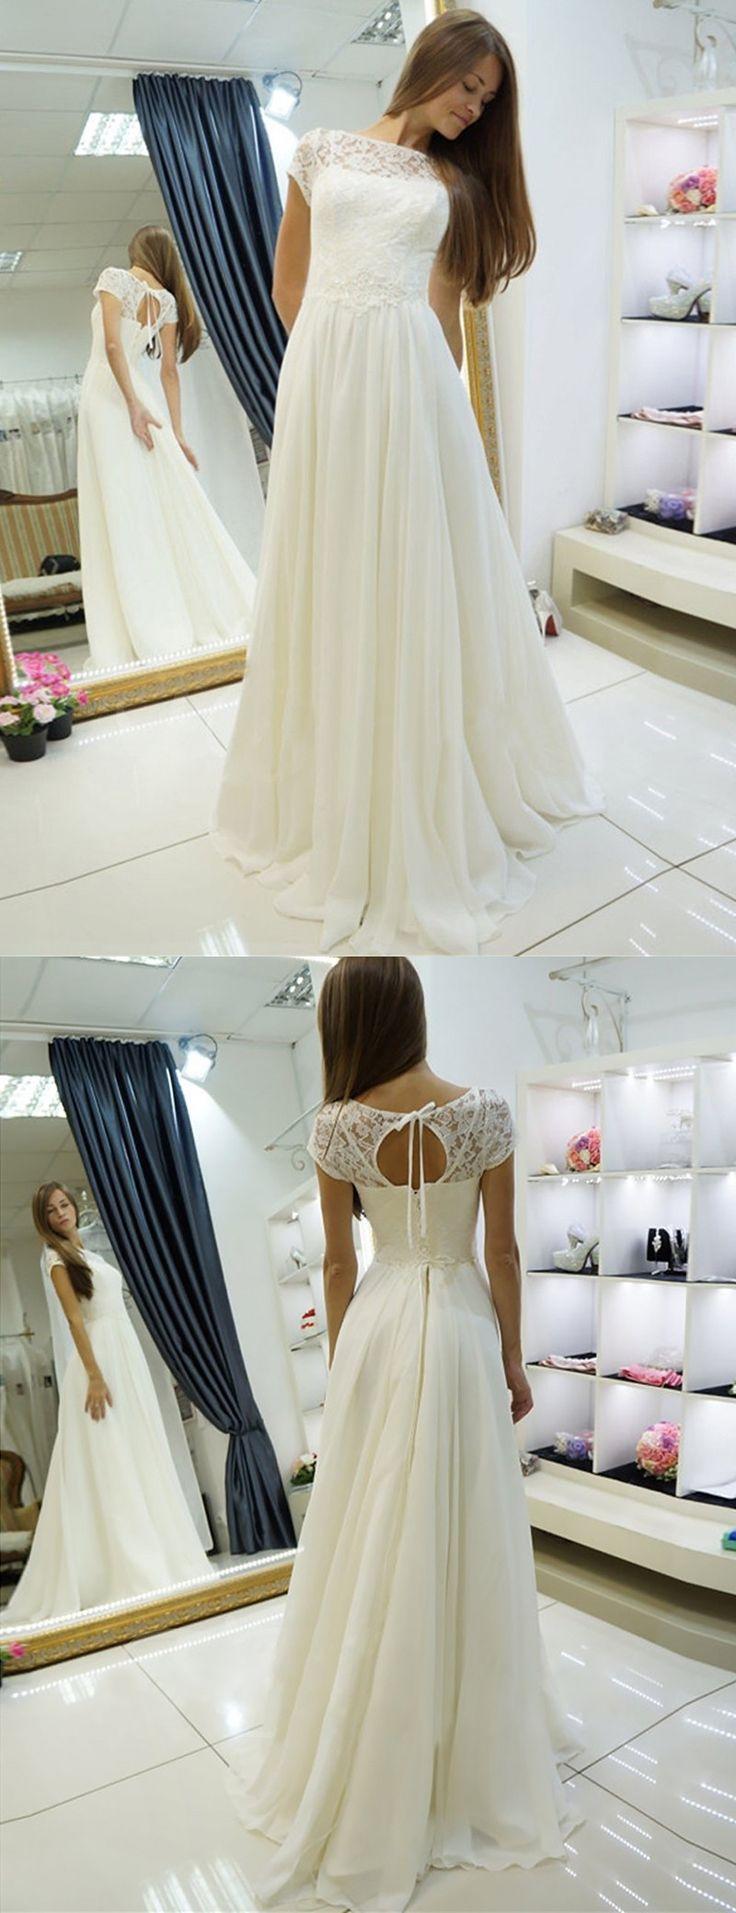 239 best Wedding images on Pinterest | Wedding ideas, Weddings and ...